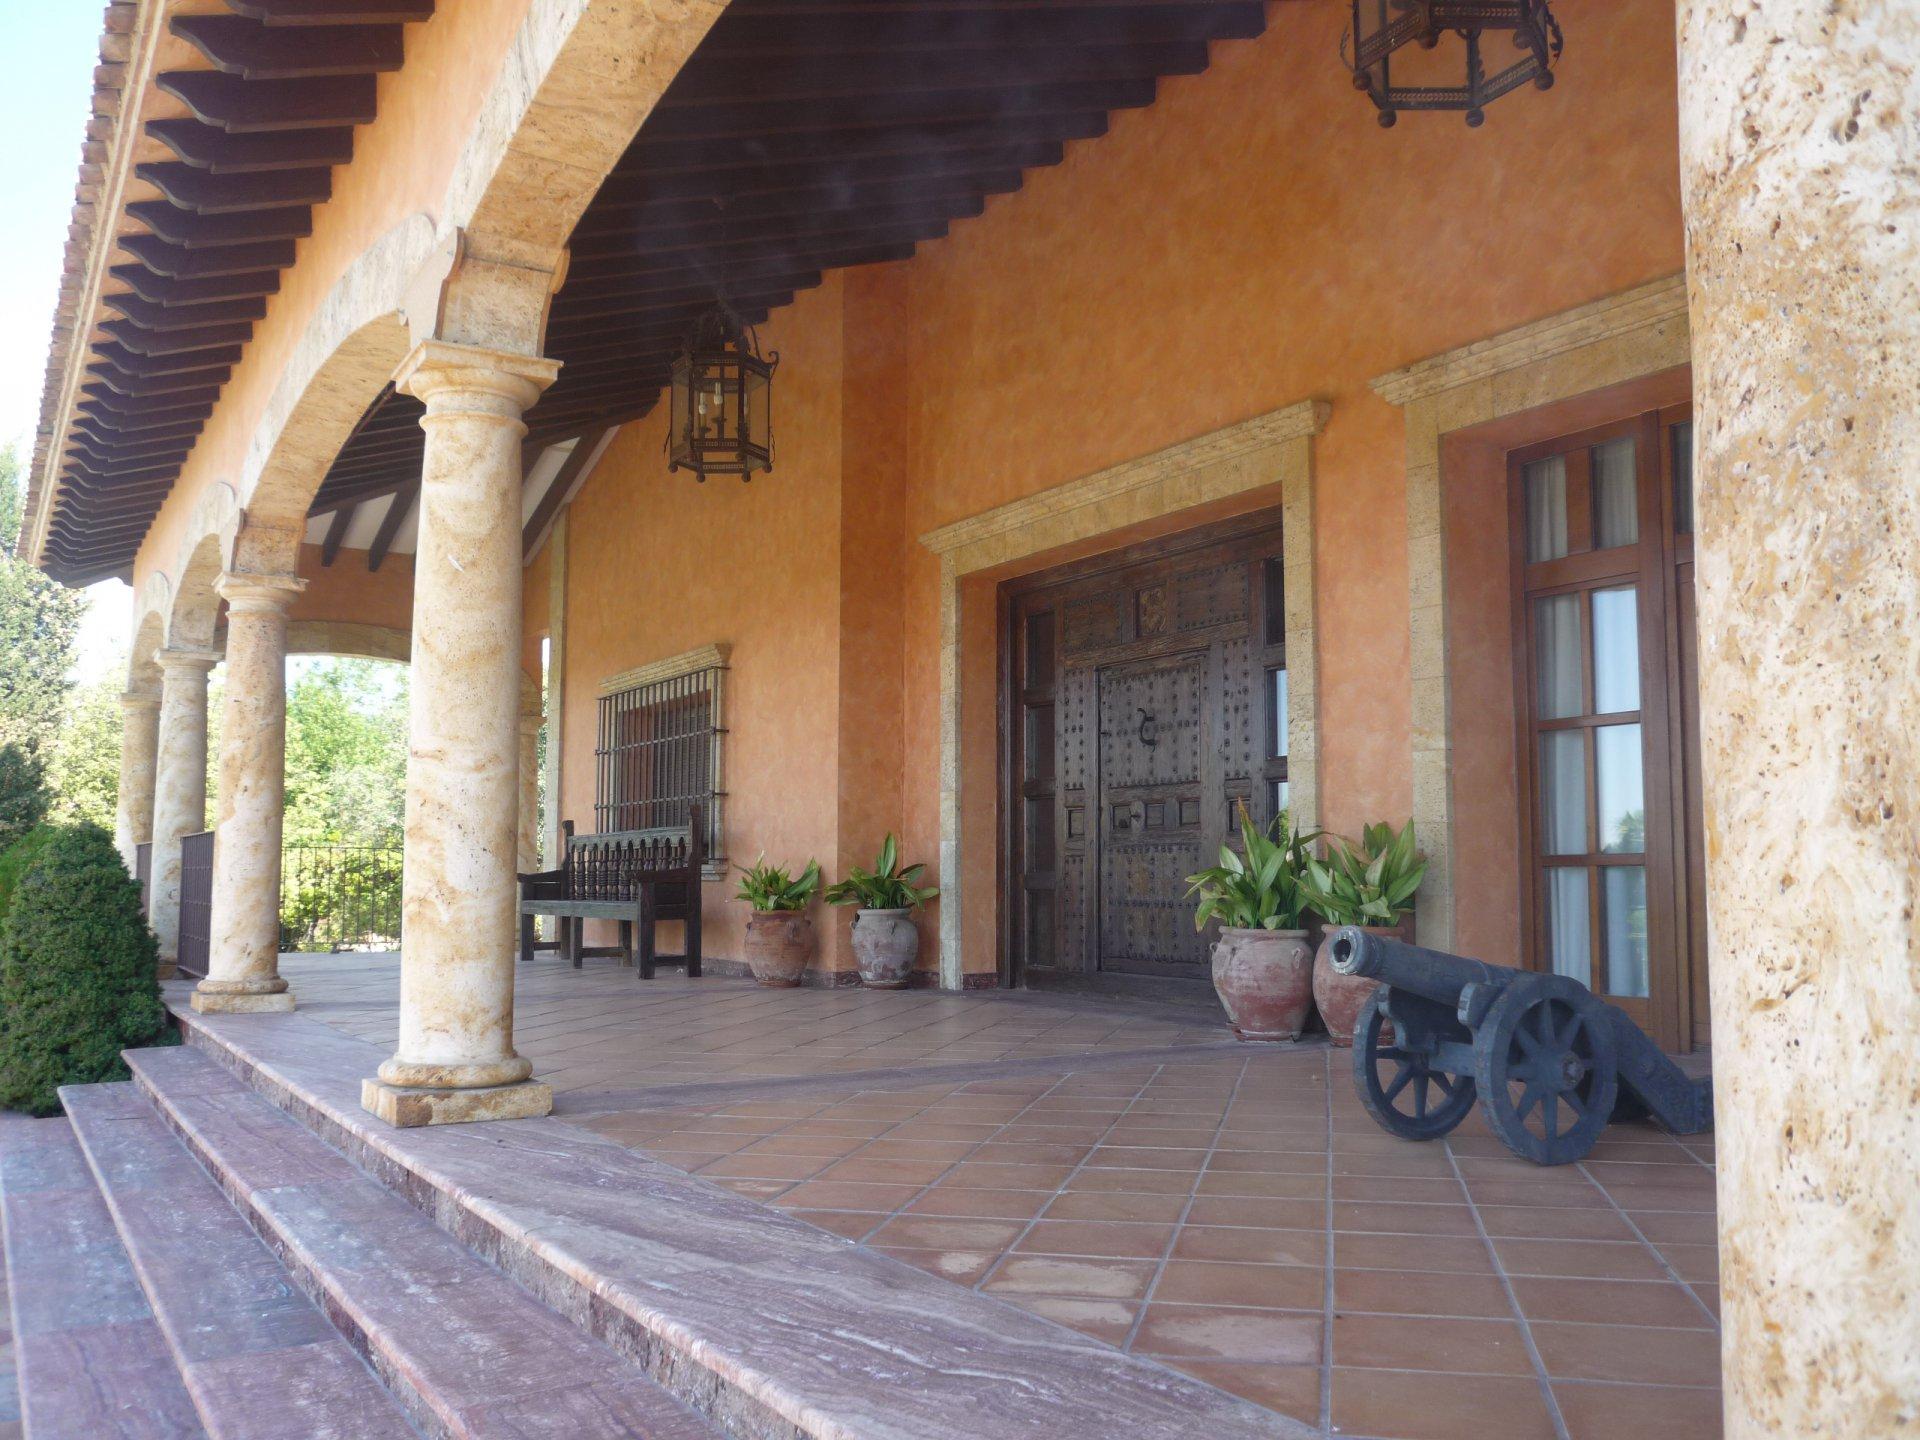 Ad Sale House Toledo (45001) ref:V0227MA